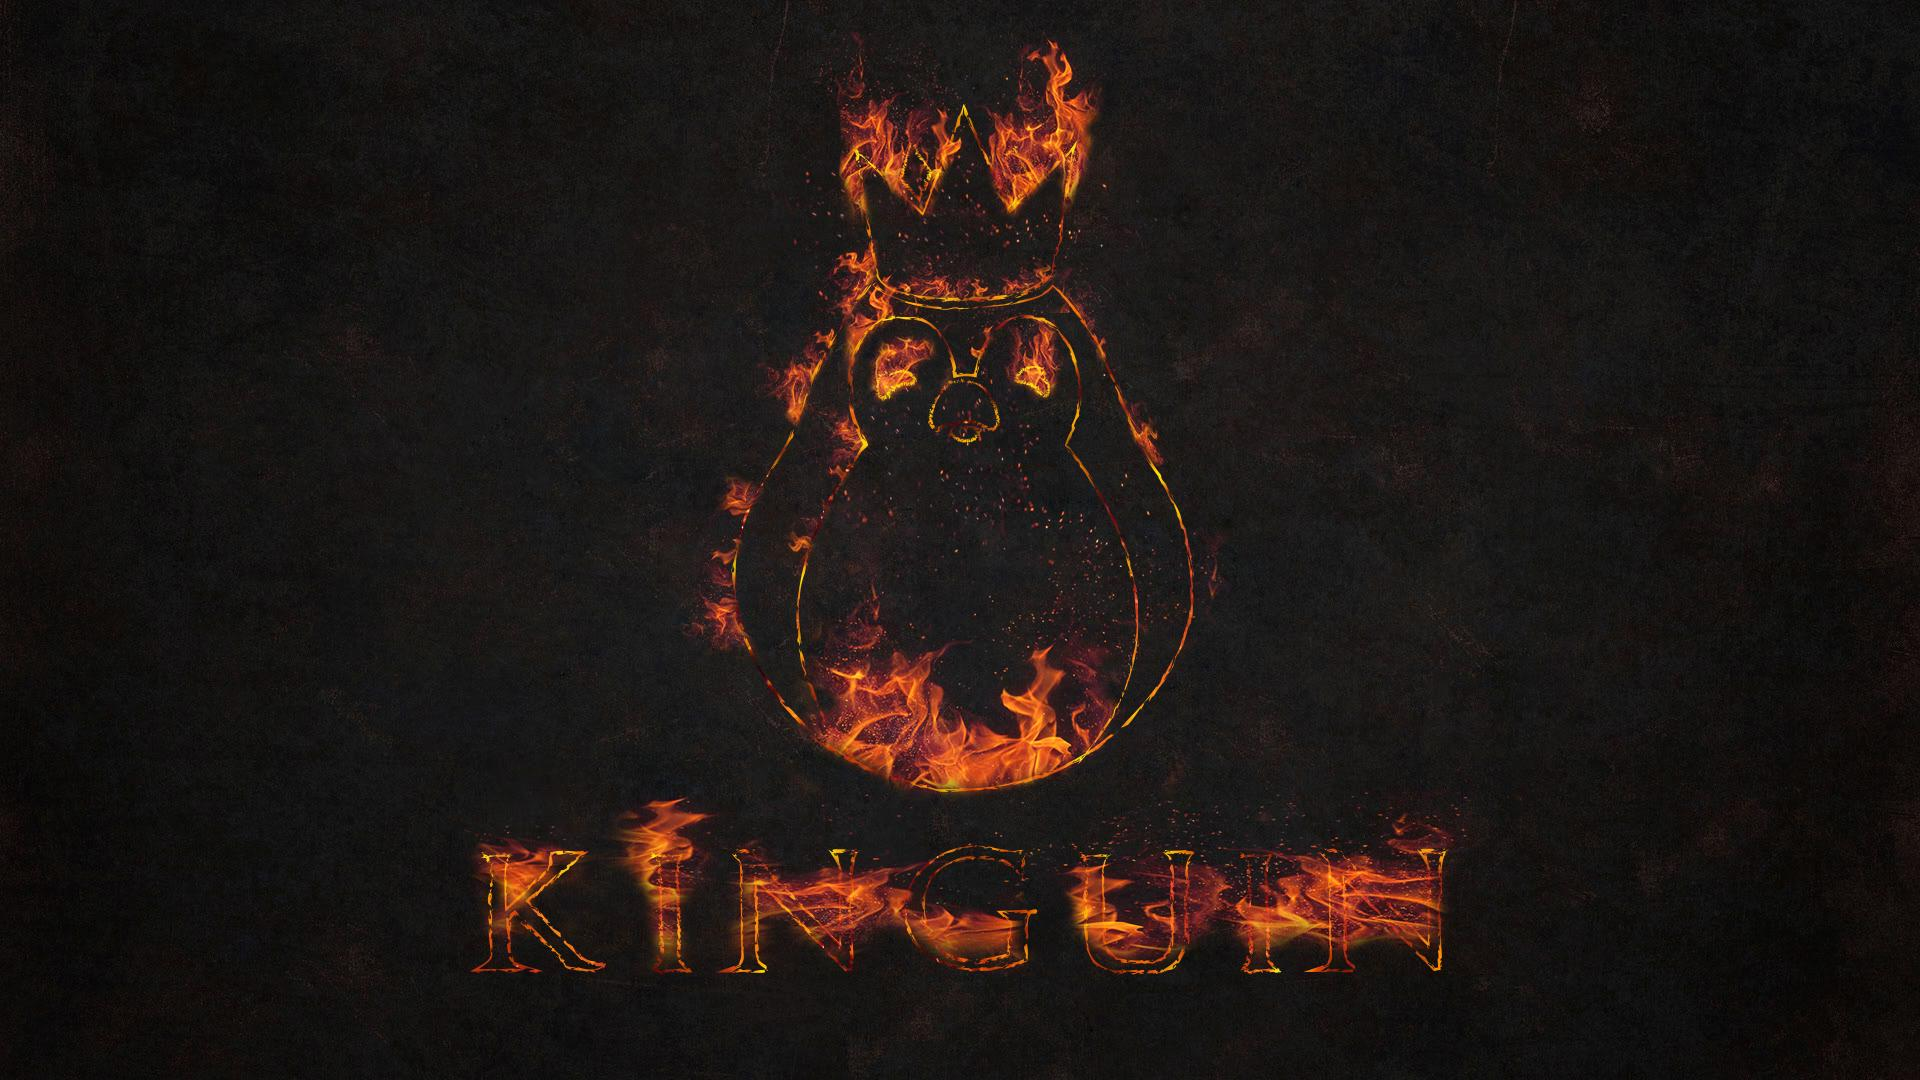 Kinguin fire